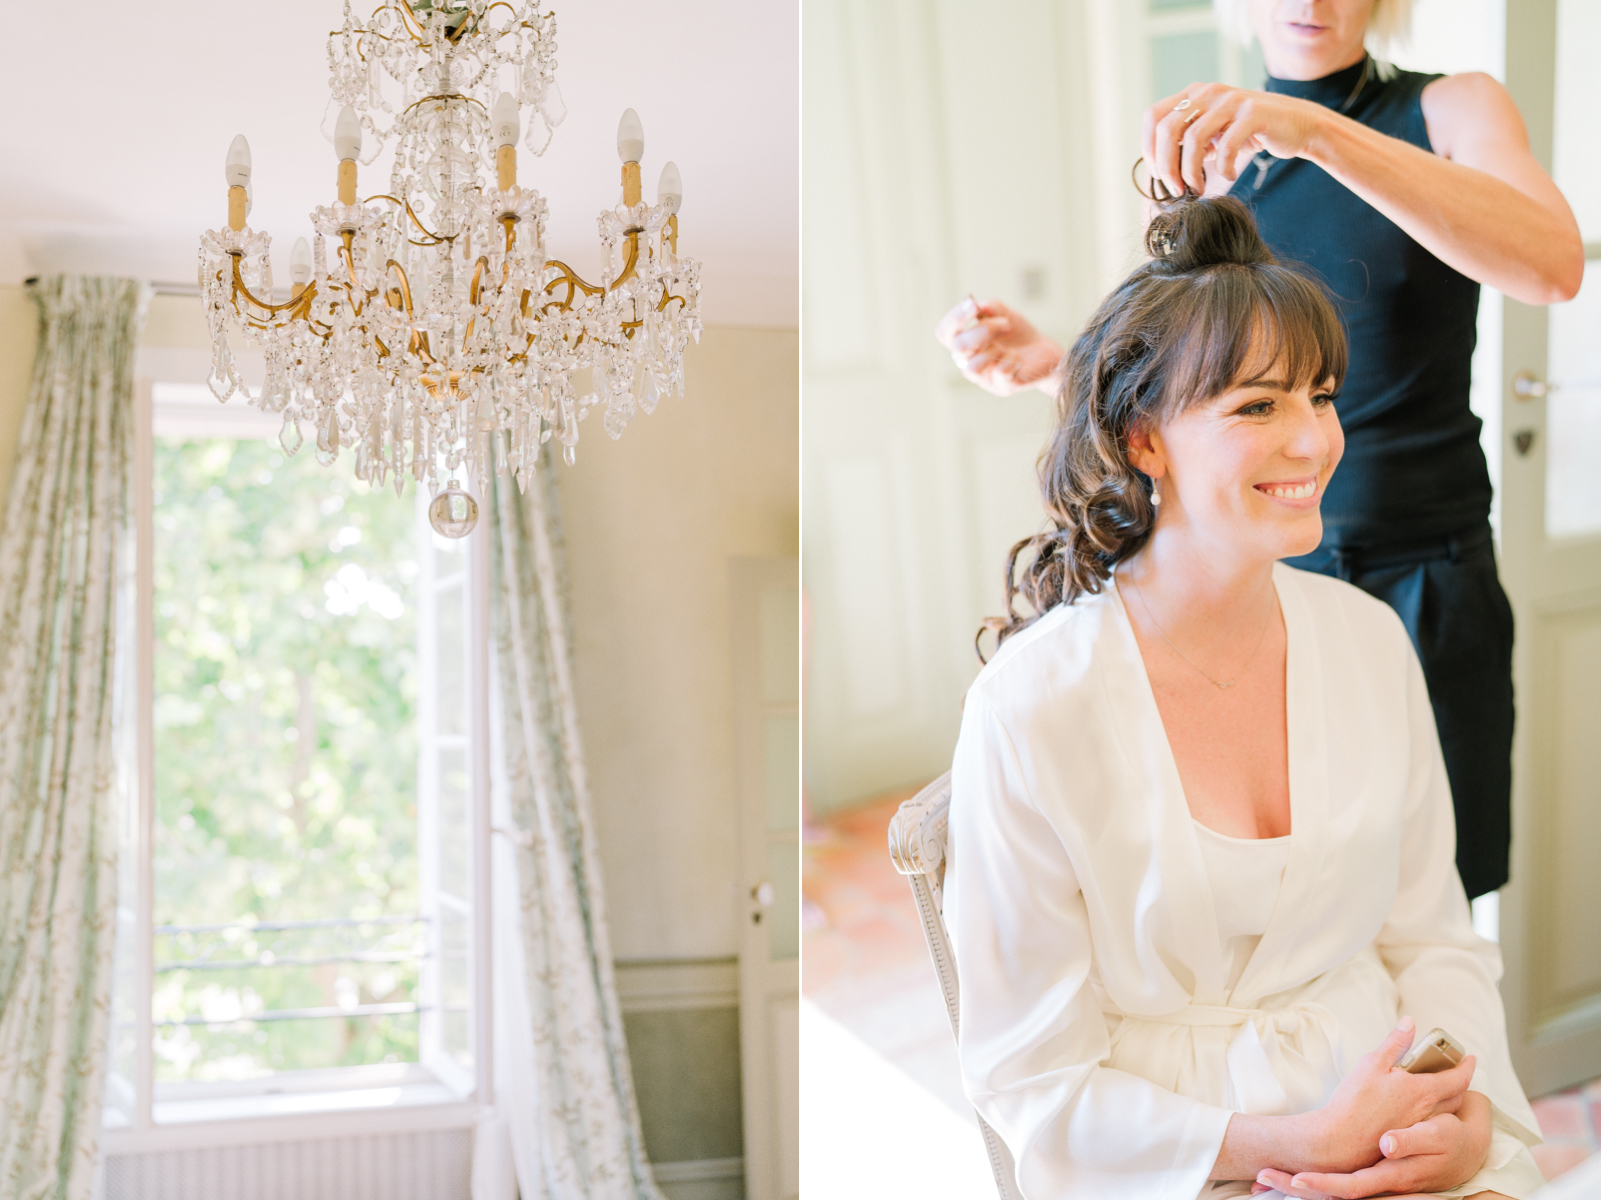 Boheme-Moon-Photography-Wedding-in-Provence-France_004.jpg